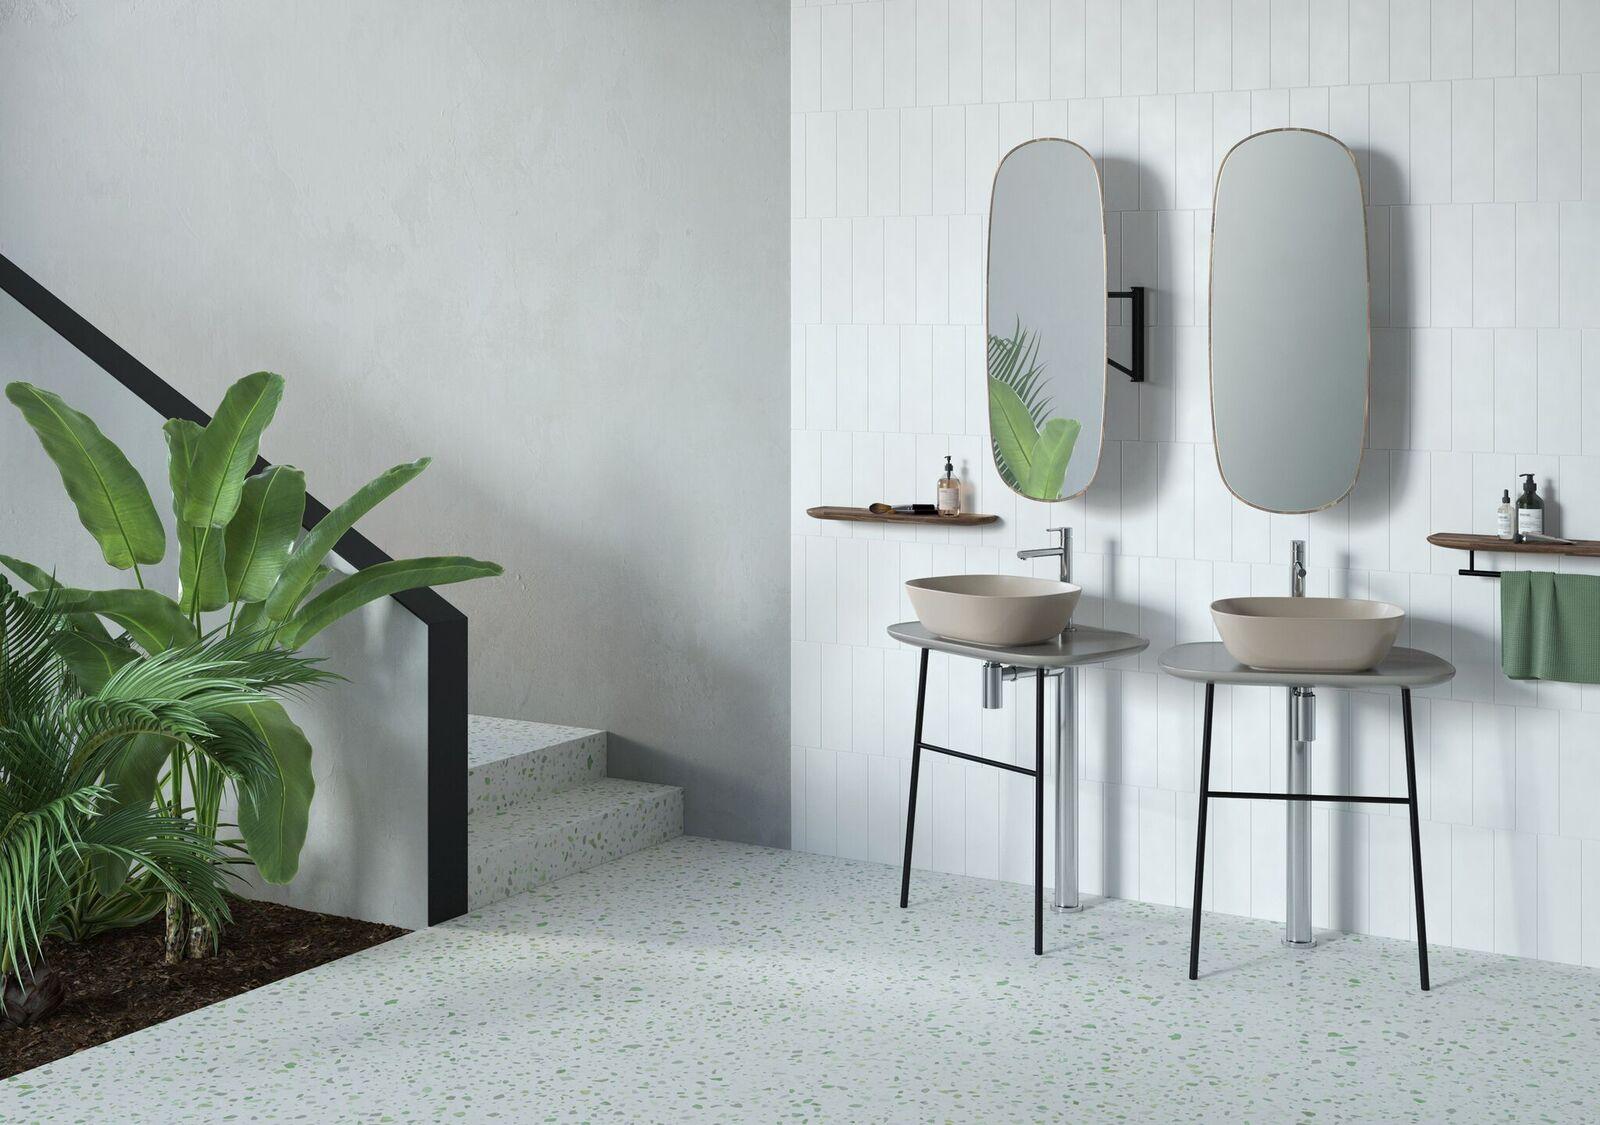 Vitra Bathrooms at designjunction for interior design events blog